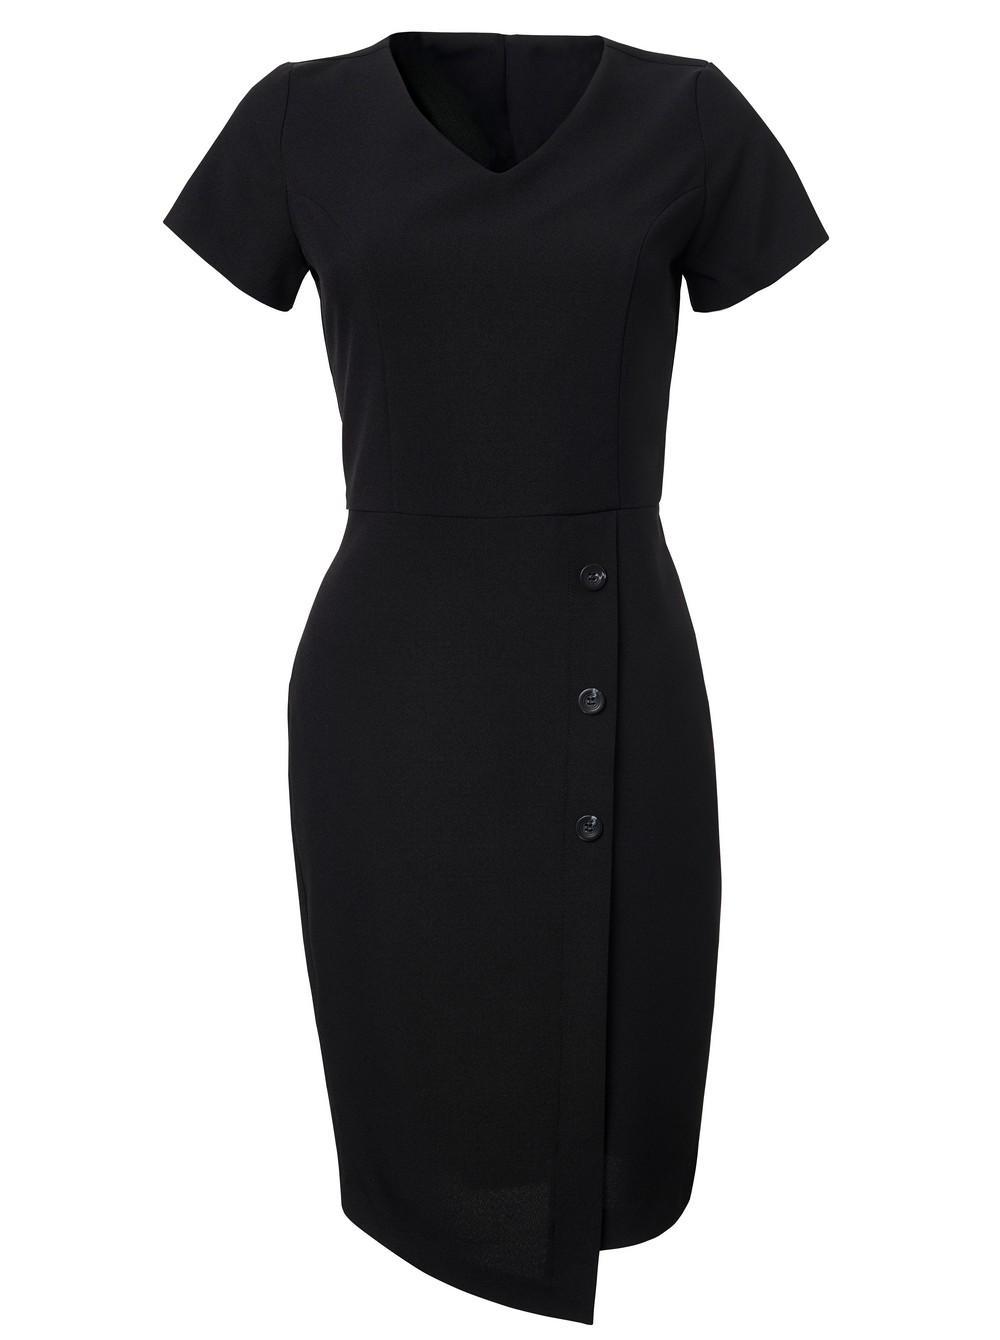 Ladies Simone Dress - Fabric 869 Black